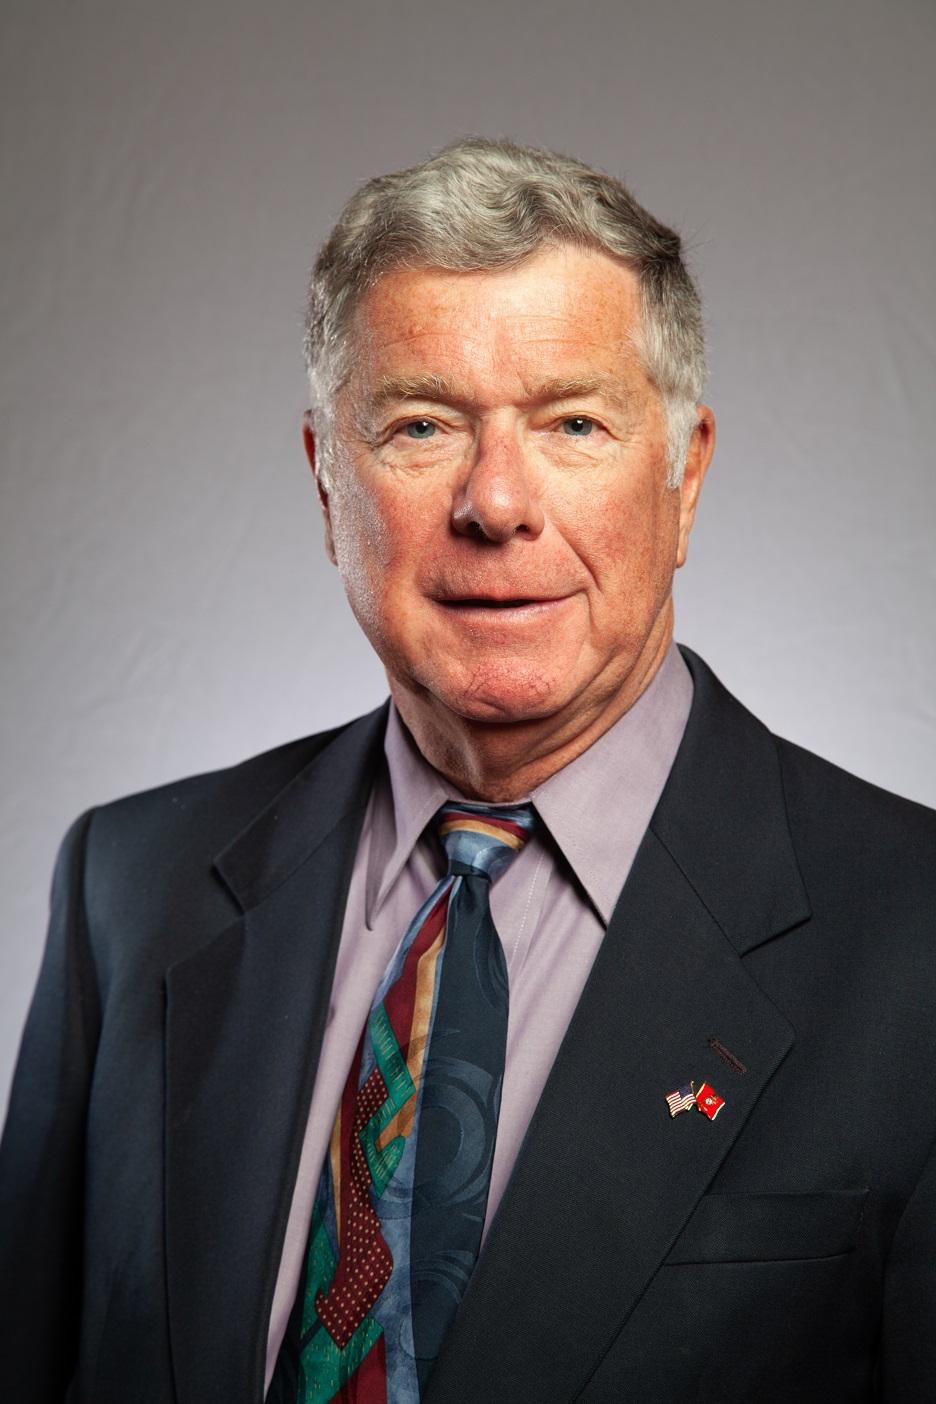 COL Brendan P. Kearney, USMC (Ret.)